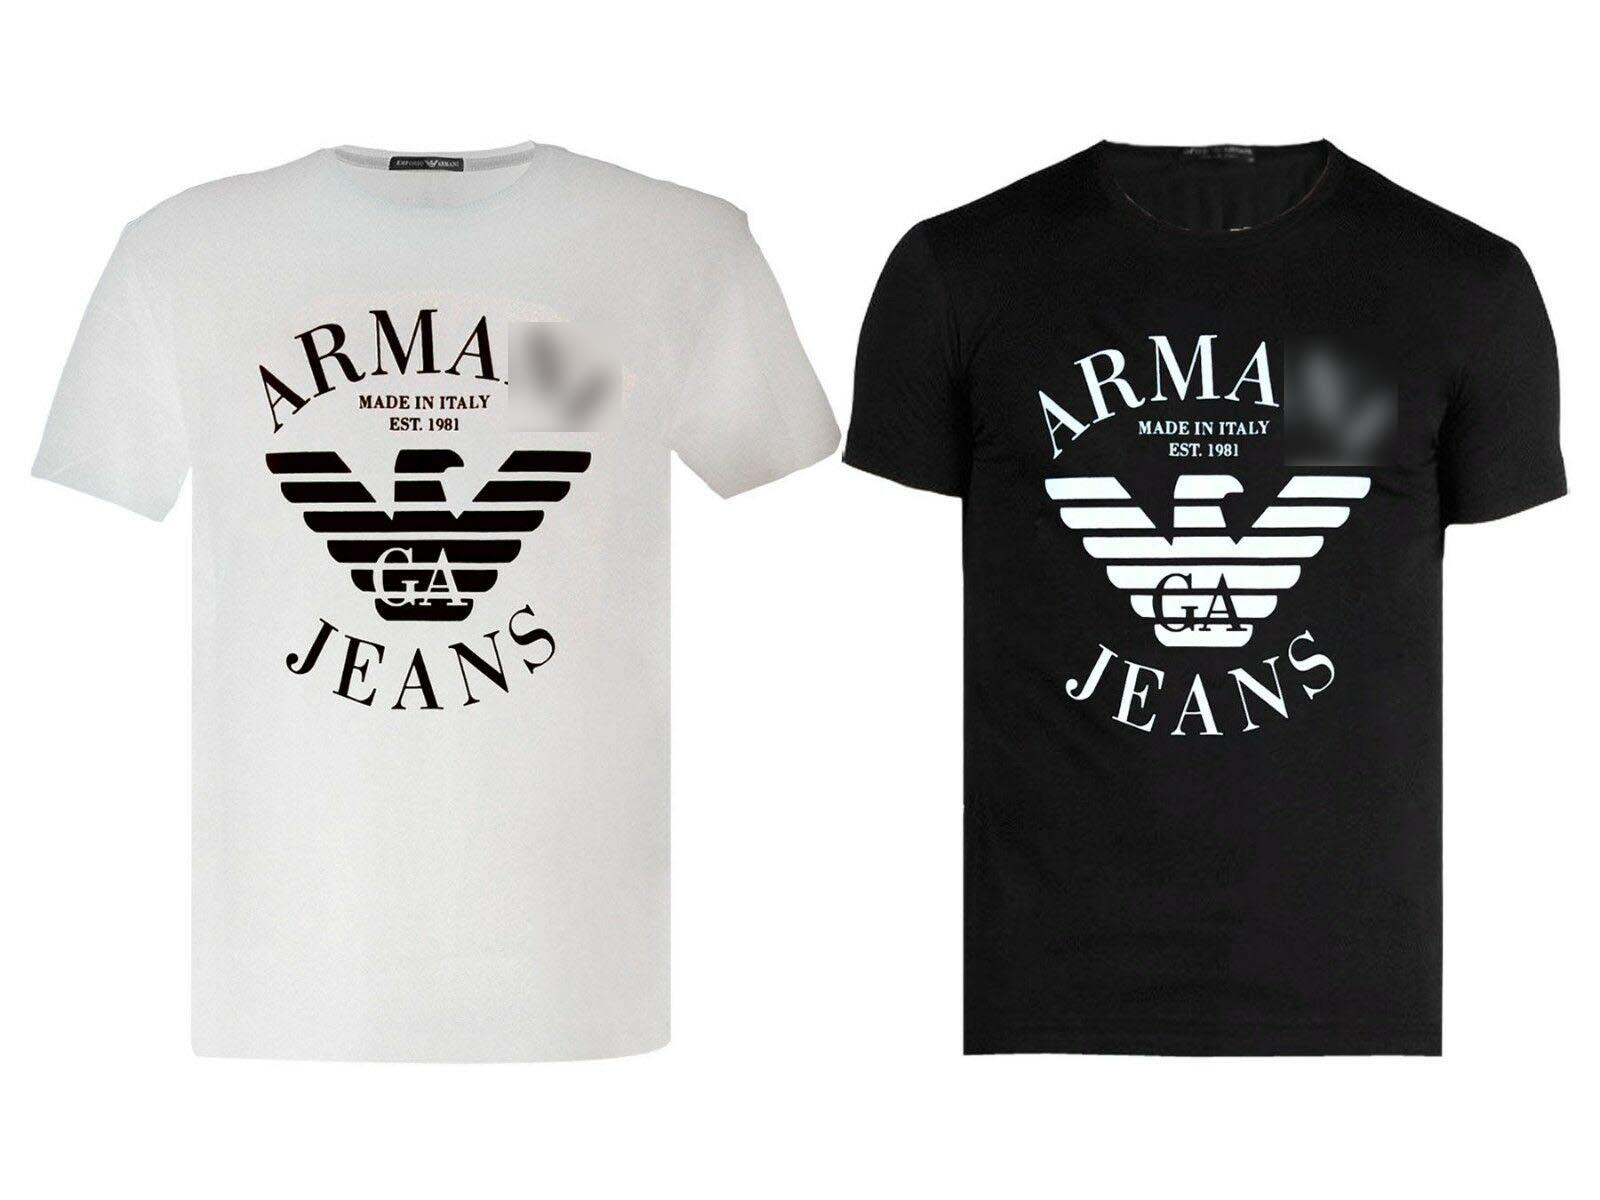 Armany AJ T-Shirt Blouse AX ALL COLORS Shirt Shirt Top Short Sleeve Cotton White Black-Mens Womens Tee Hoodie Free Shipping